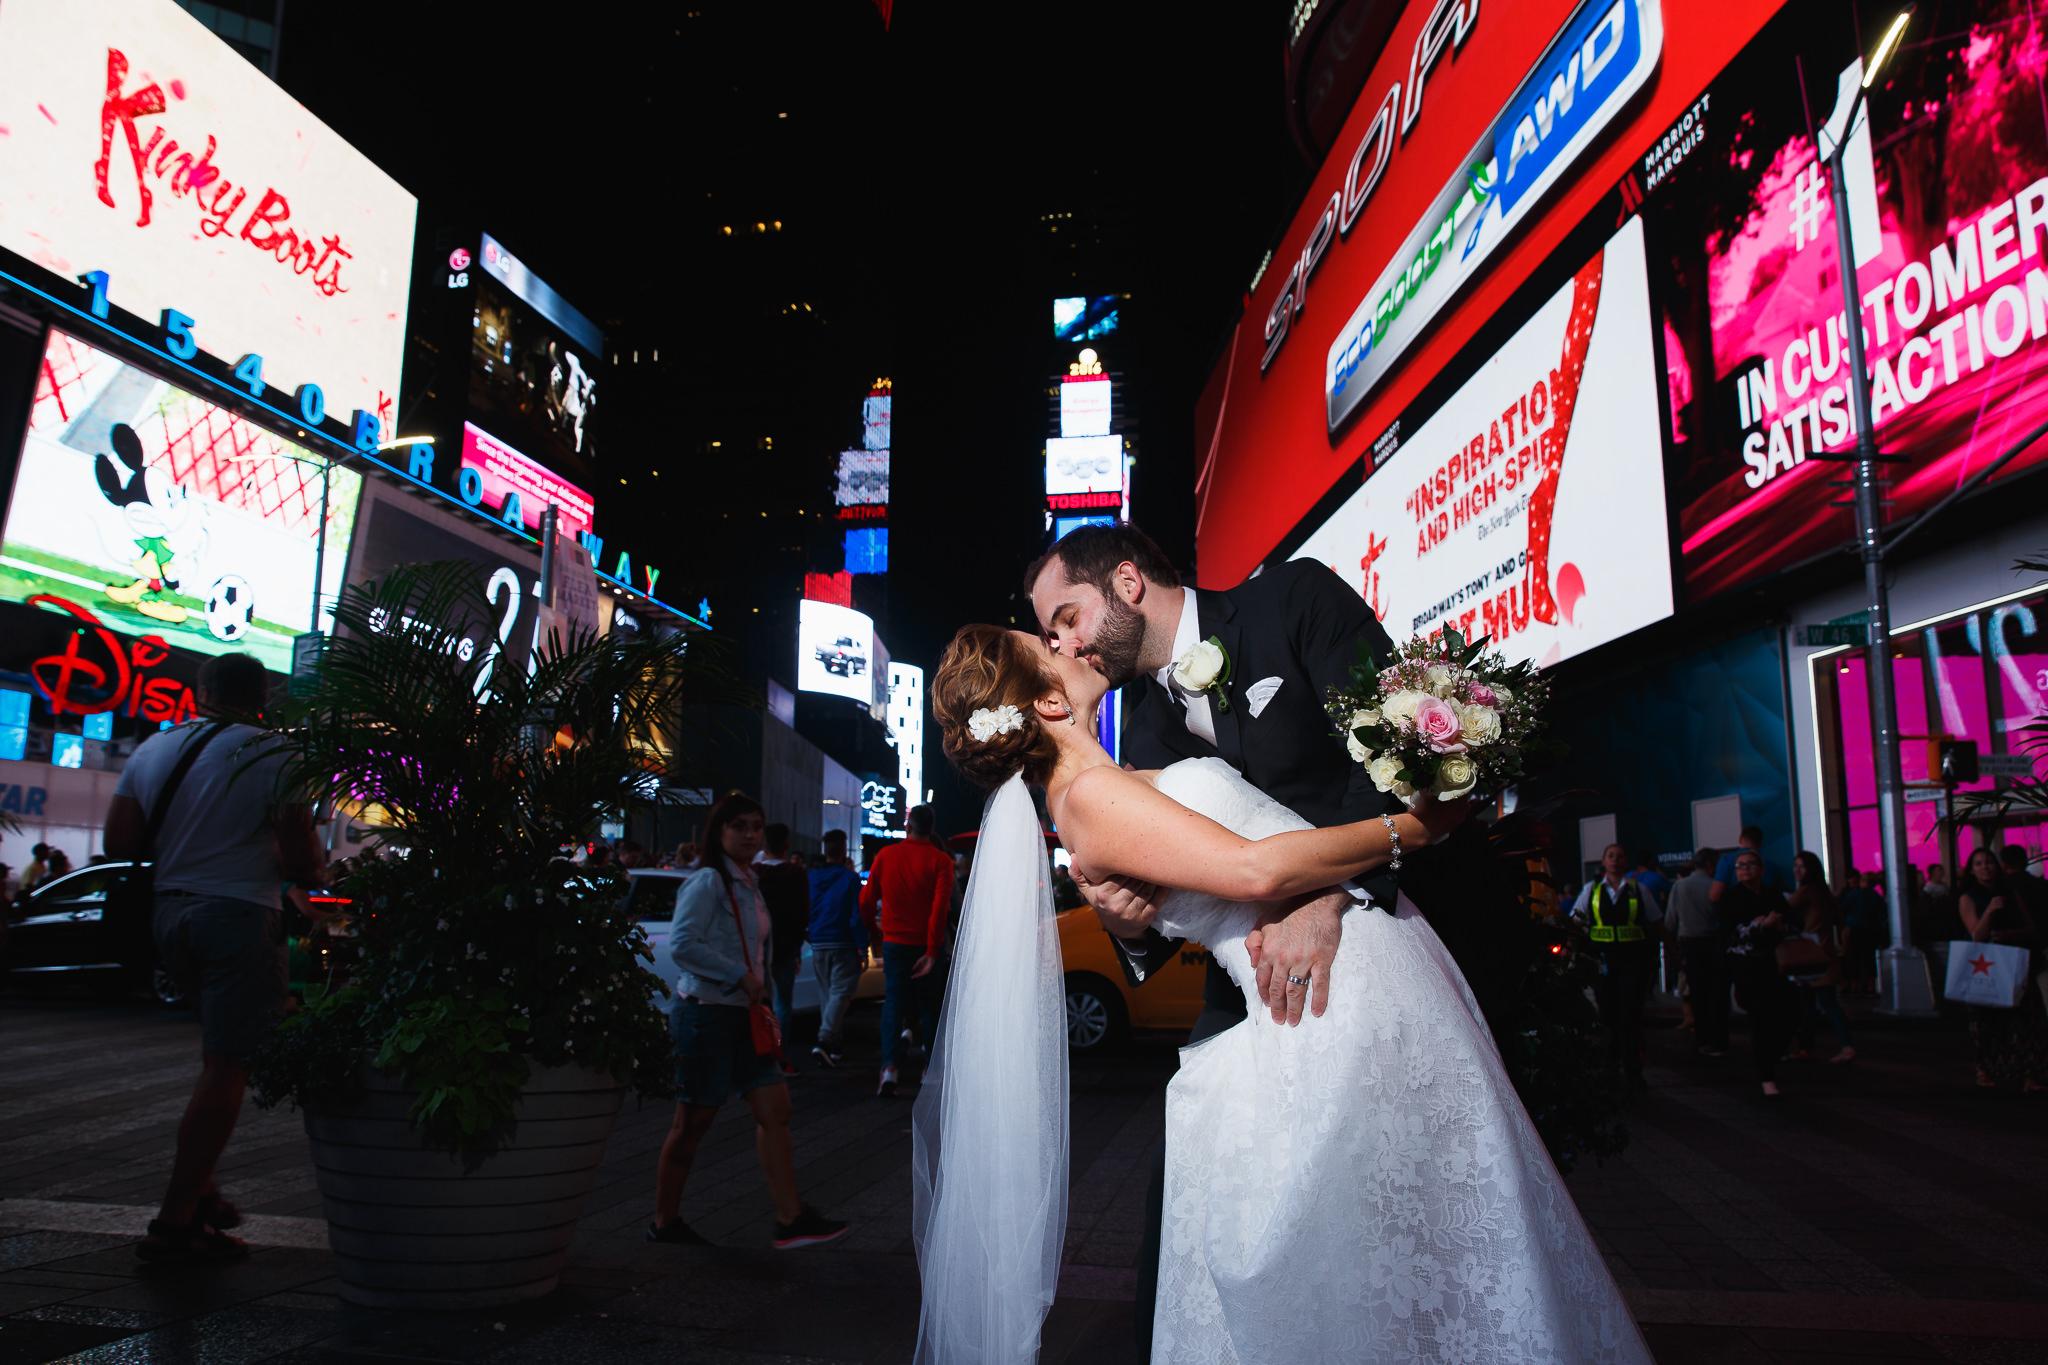 Times Square Wedding, Sarah Bode-Clark Photography, New York City Wedding Photographer